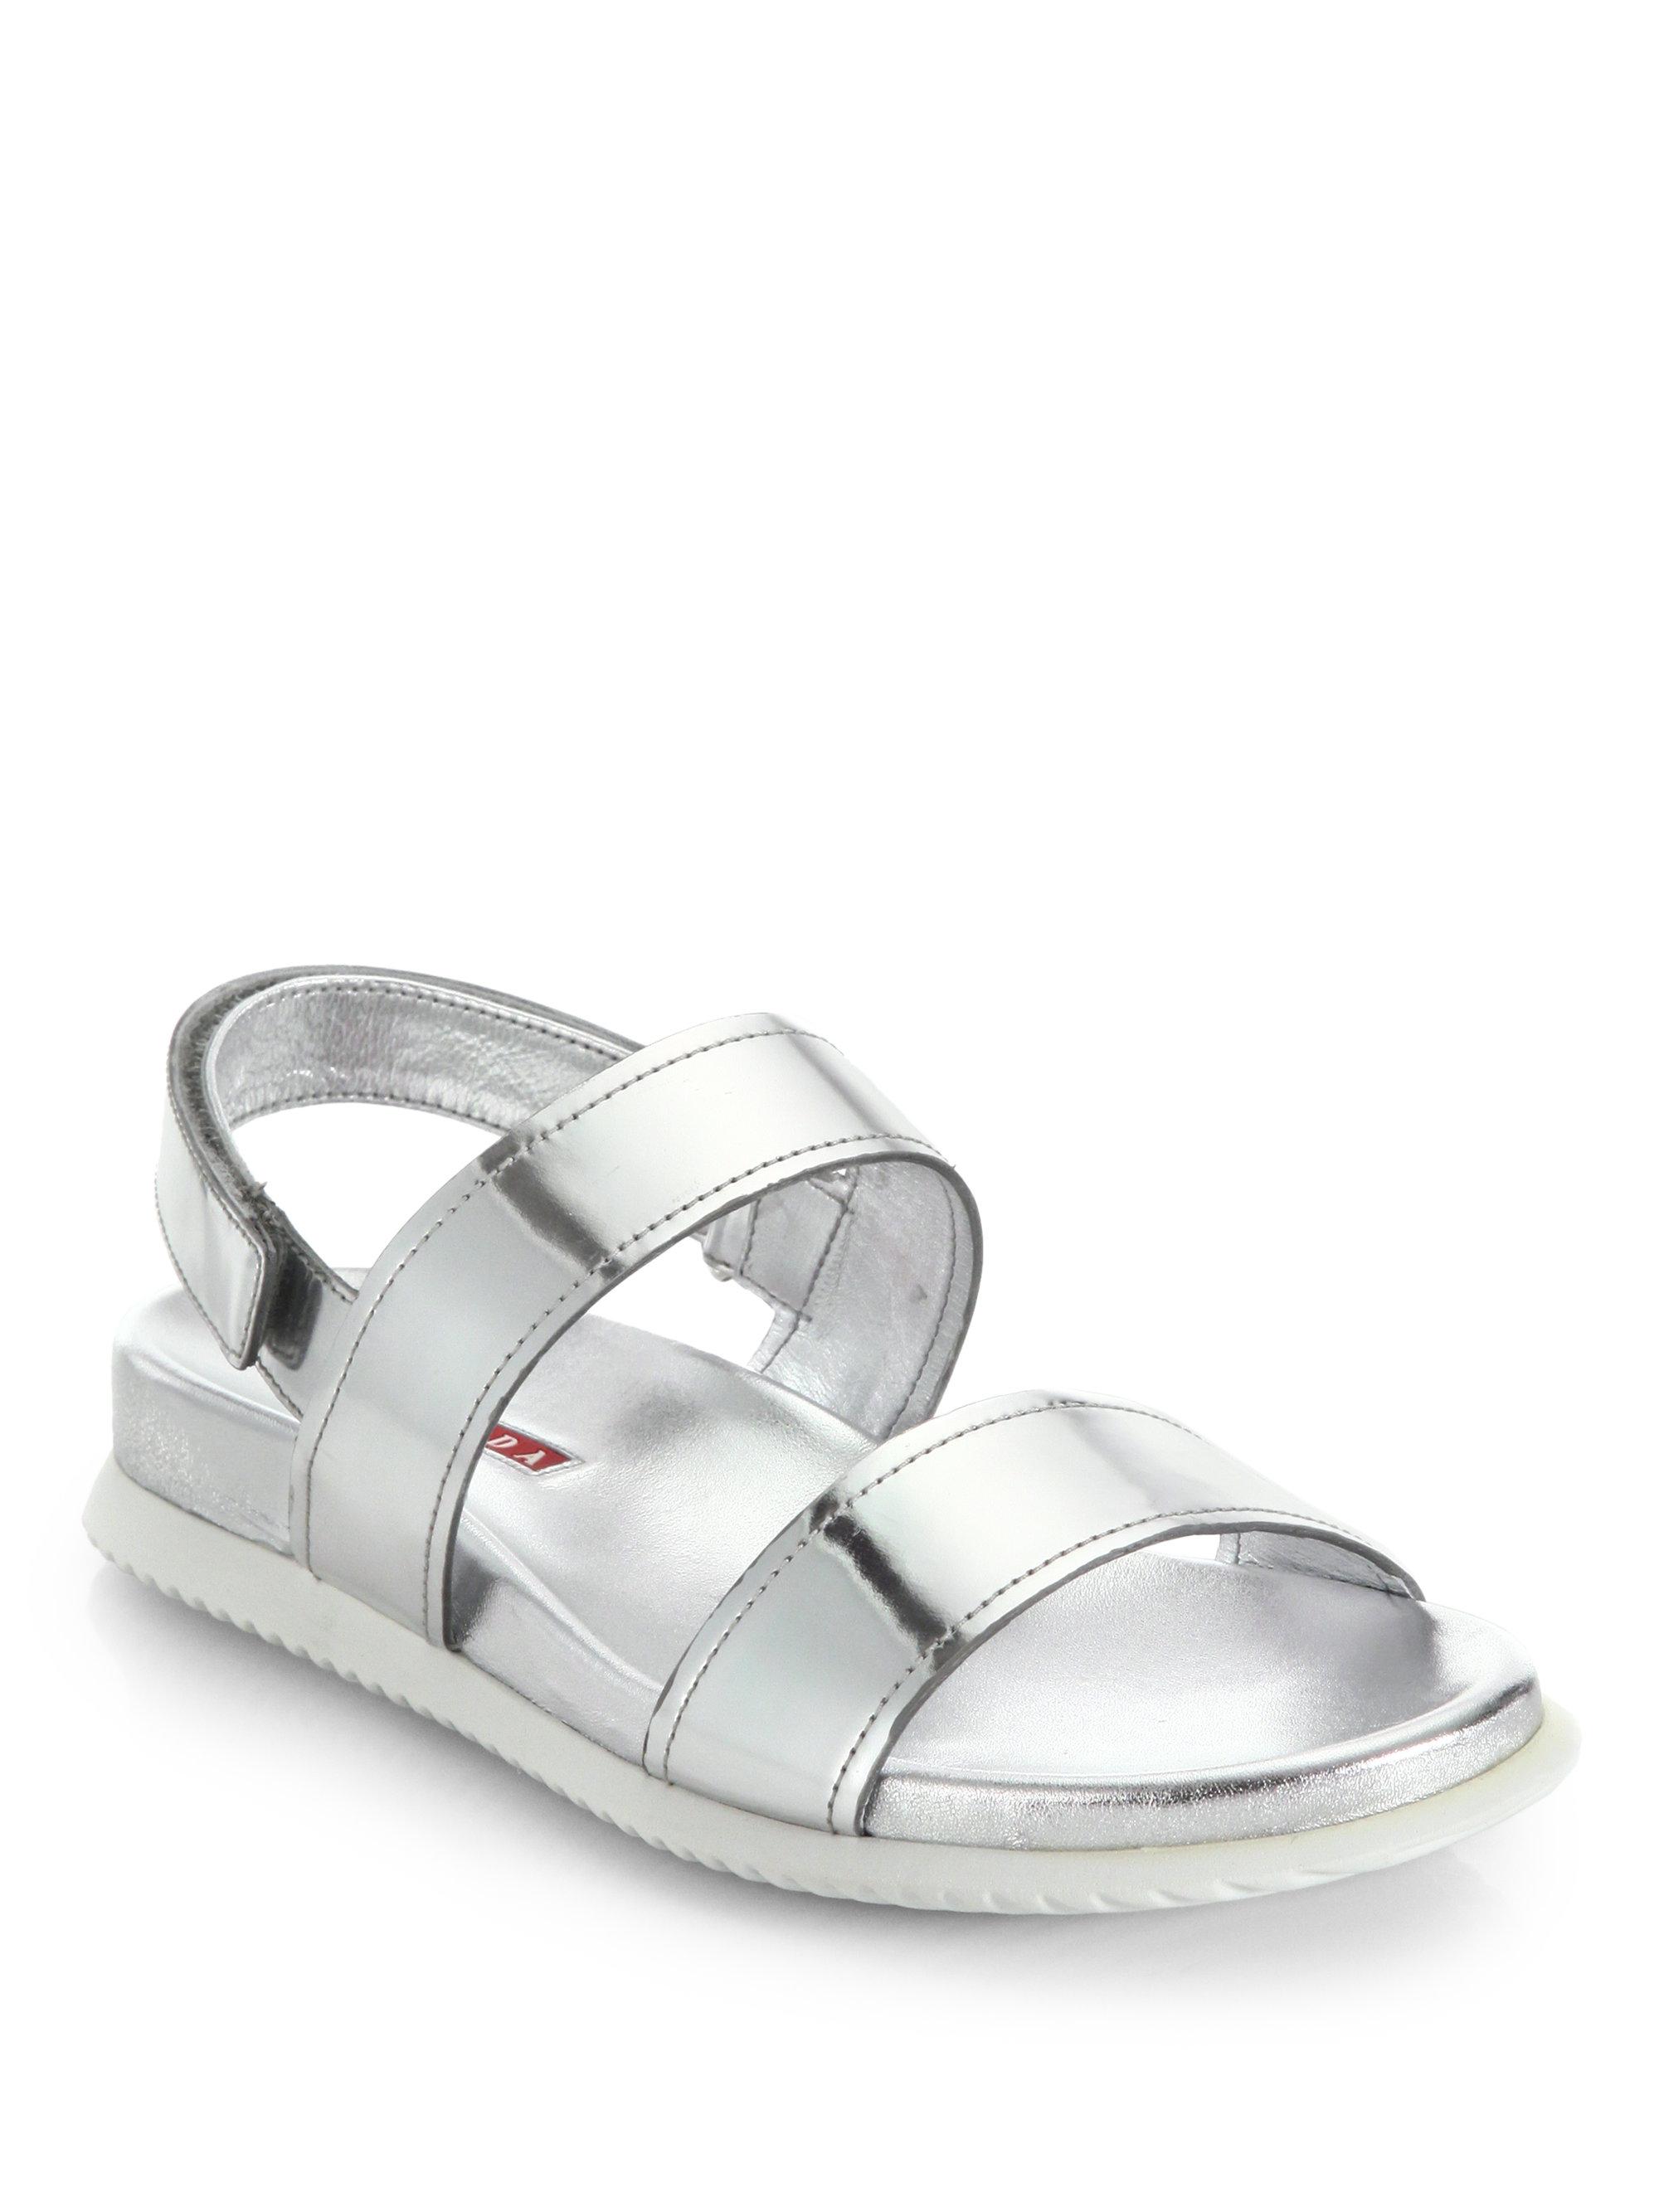 f764094826a1 Lyst - Prada Patent Leather Flat Sandals in Metallic